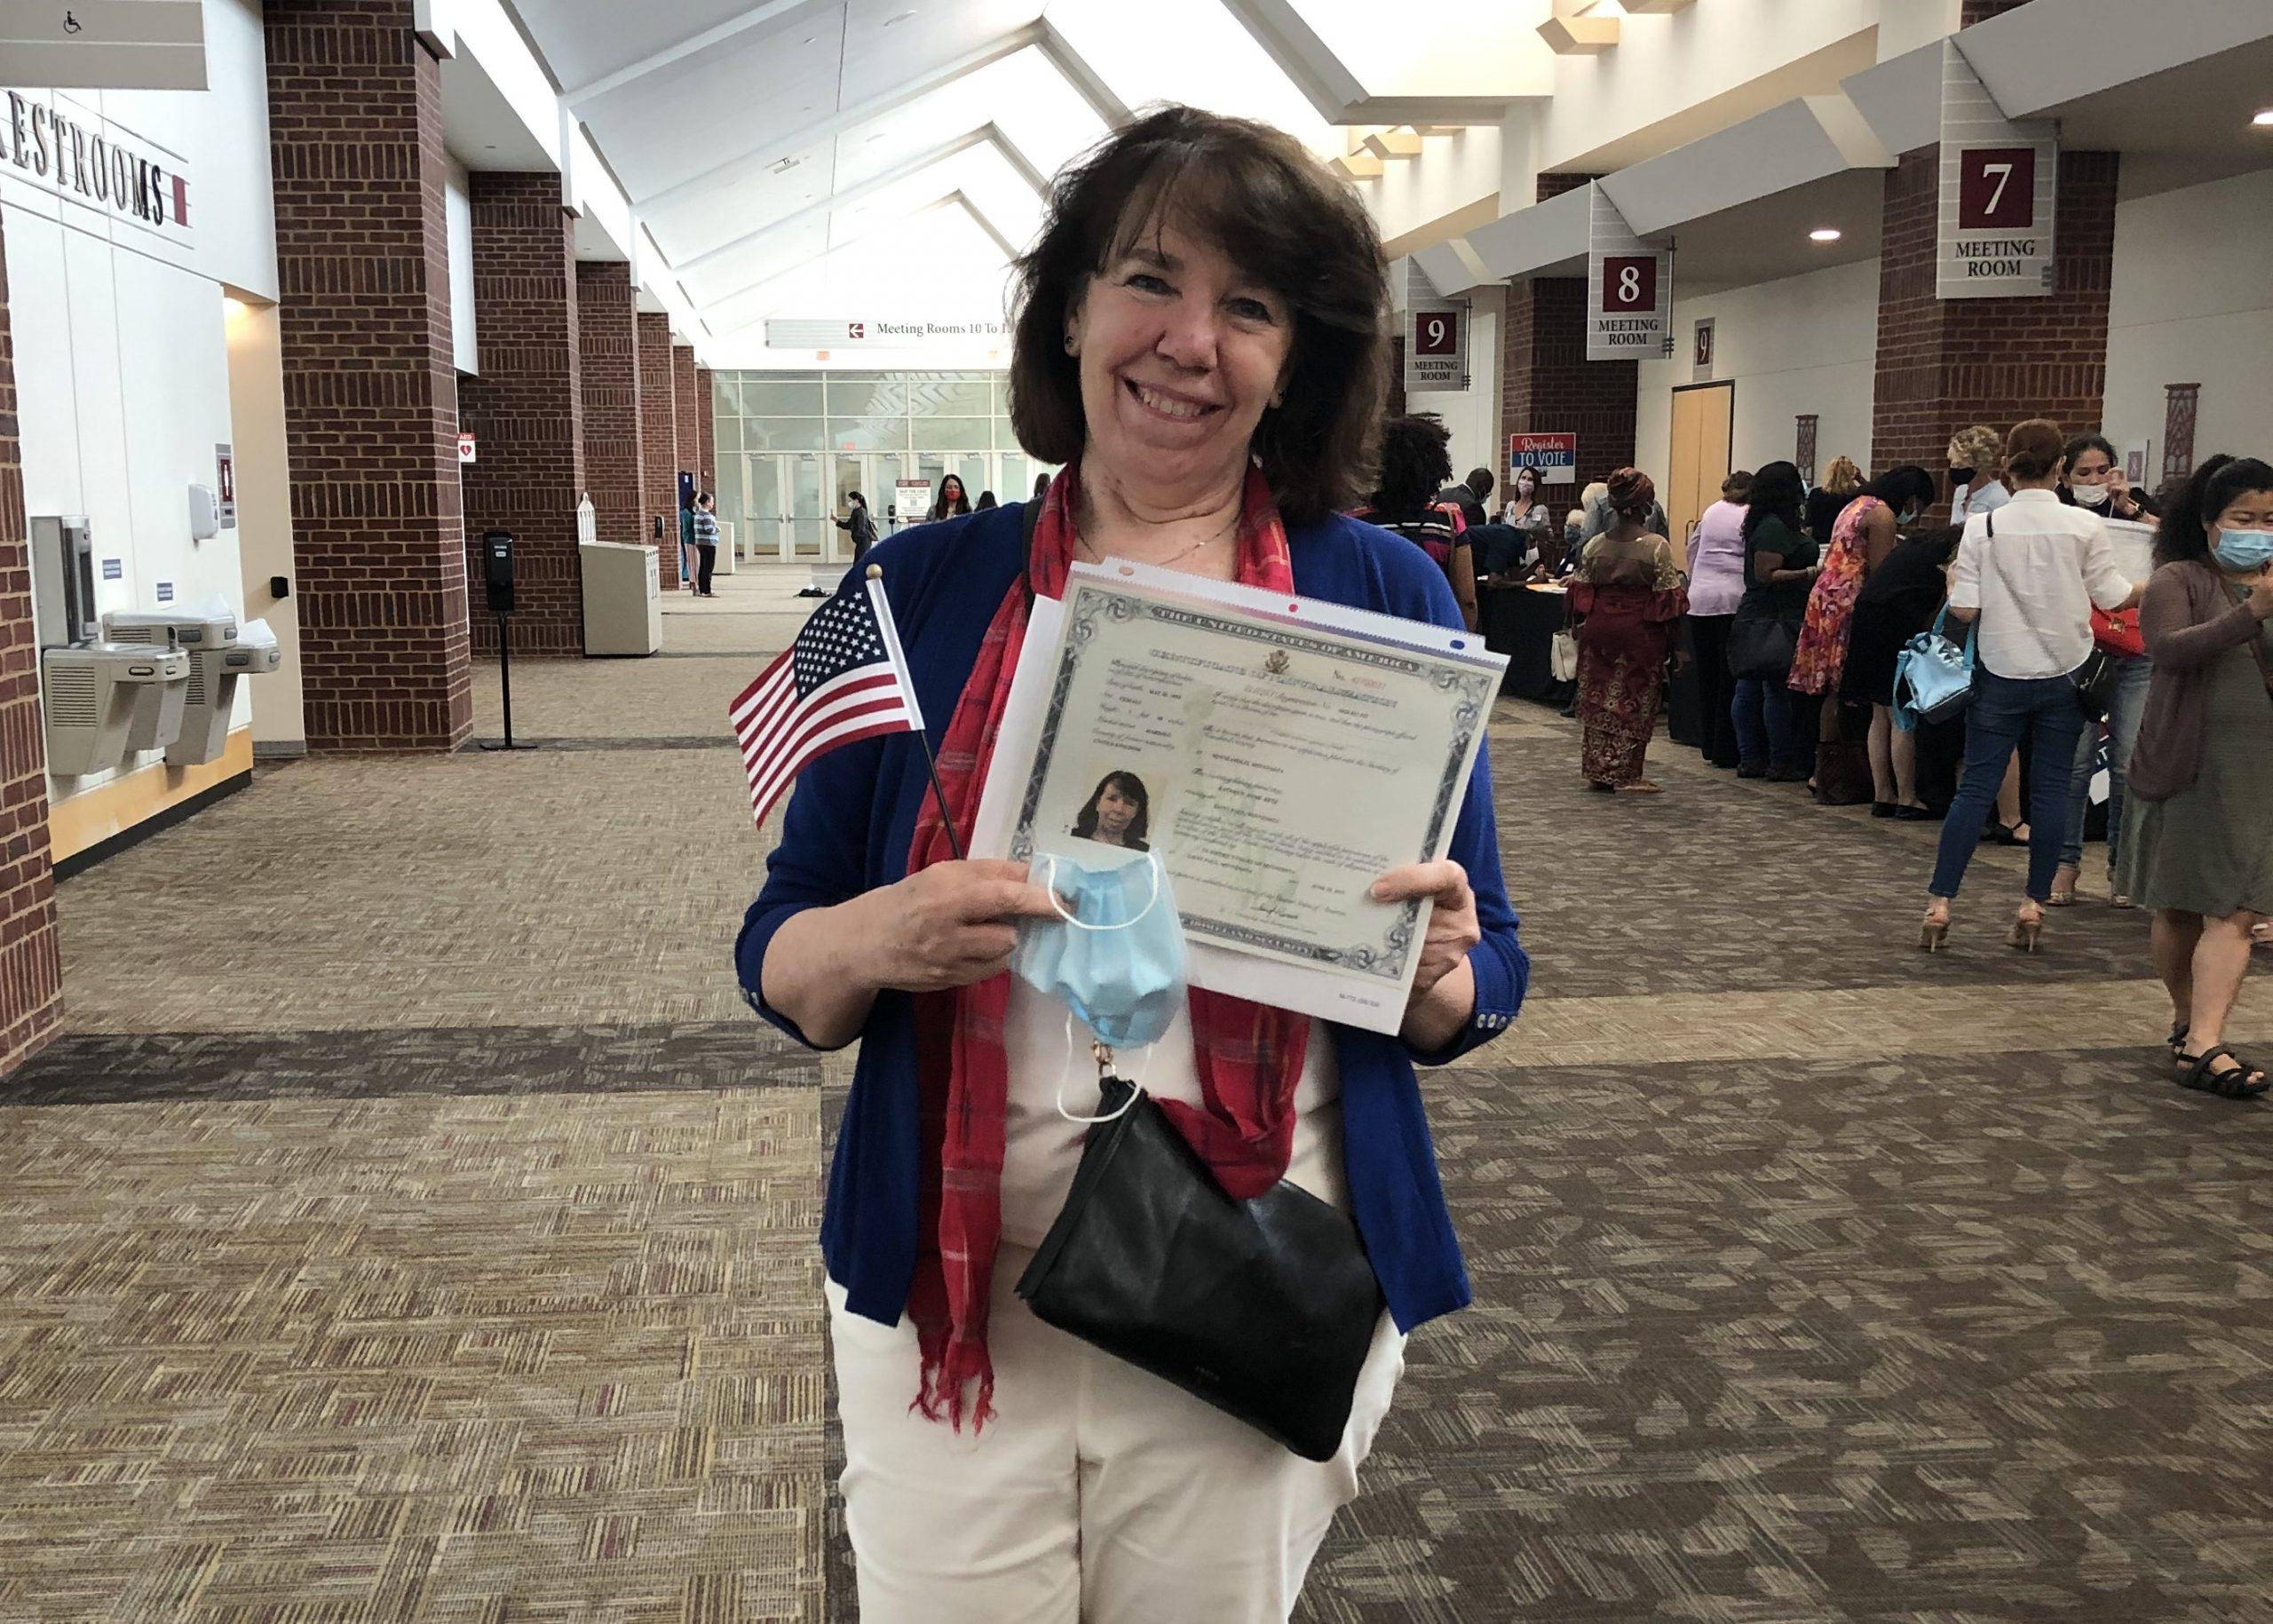 Anne Ketz Becomes an American Citizen